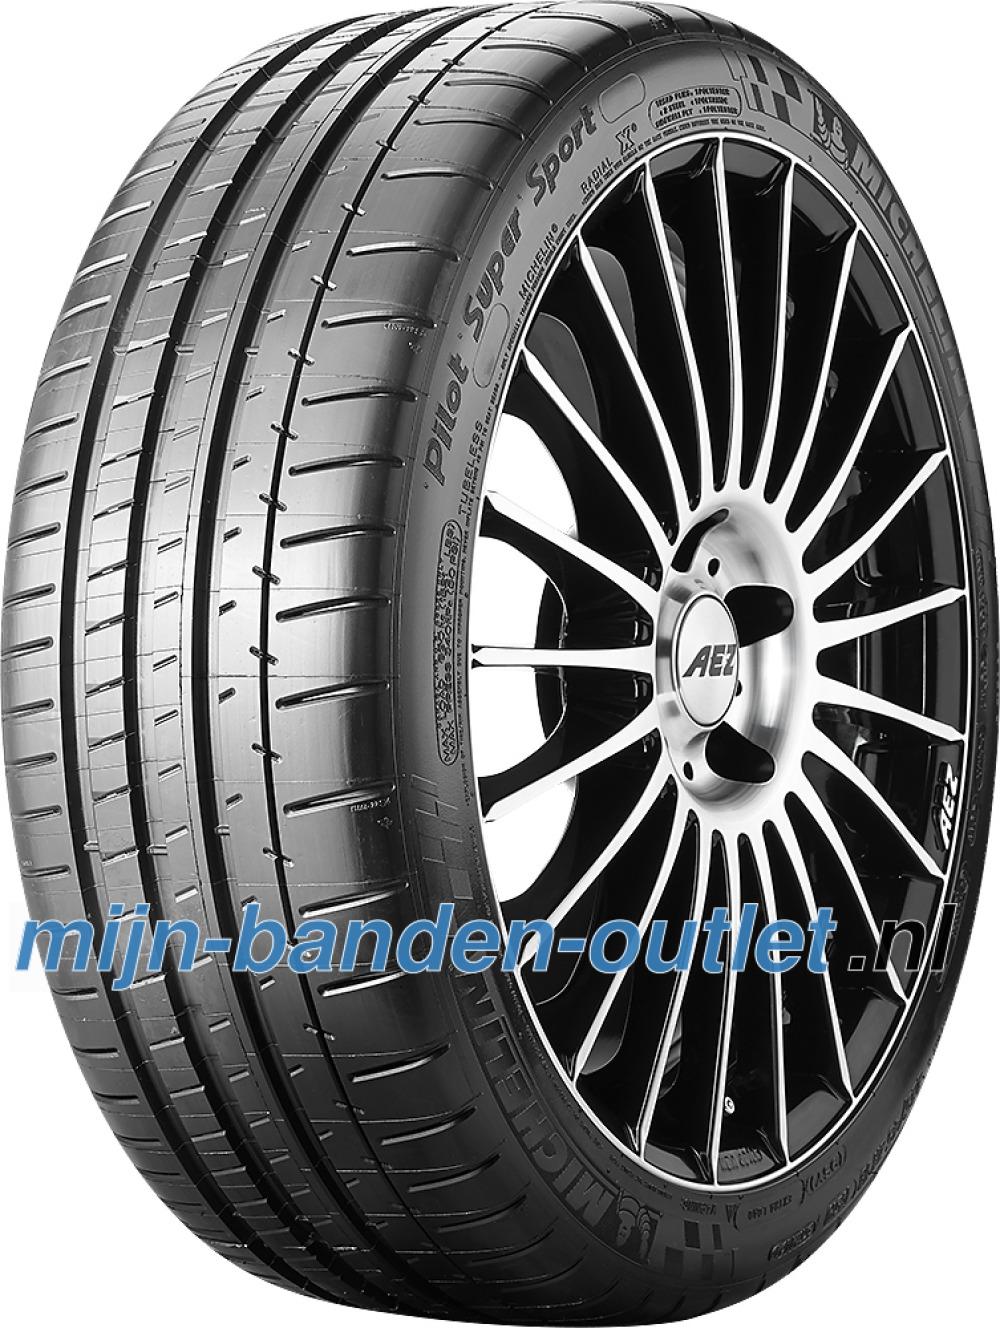 Michelin Pilot Super Sport ( 255/40 ZR18 (99Y) XL MO1, met wangbescherming (FSL) )